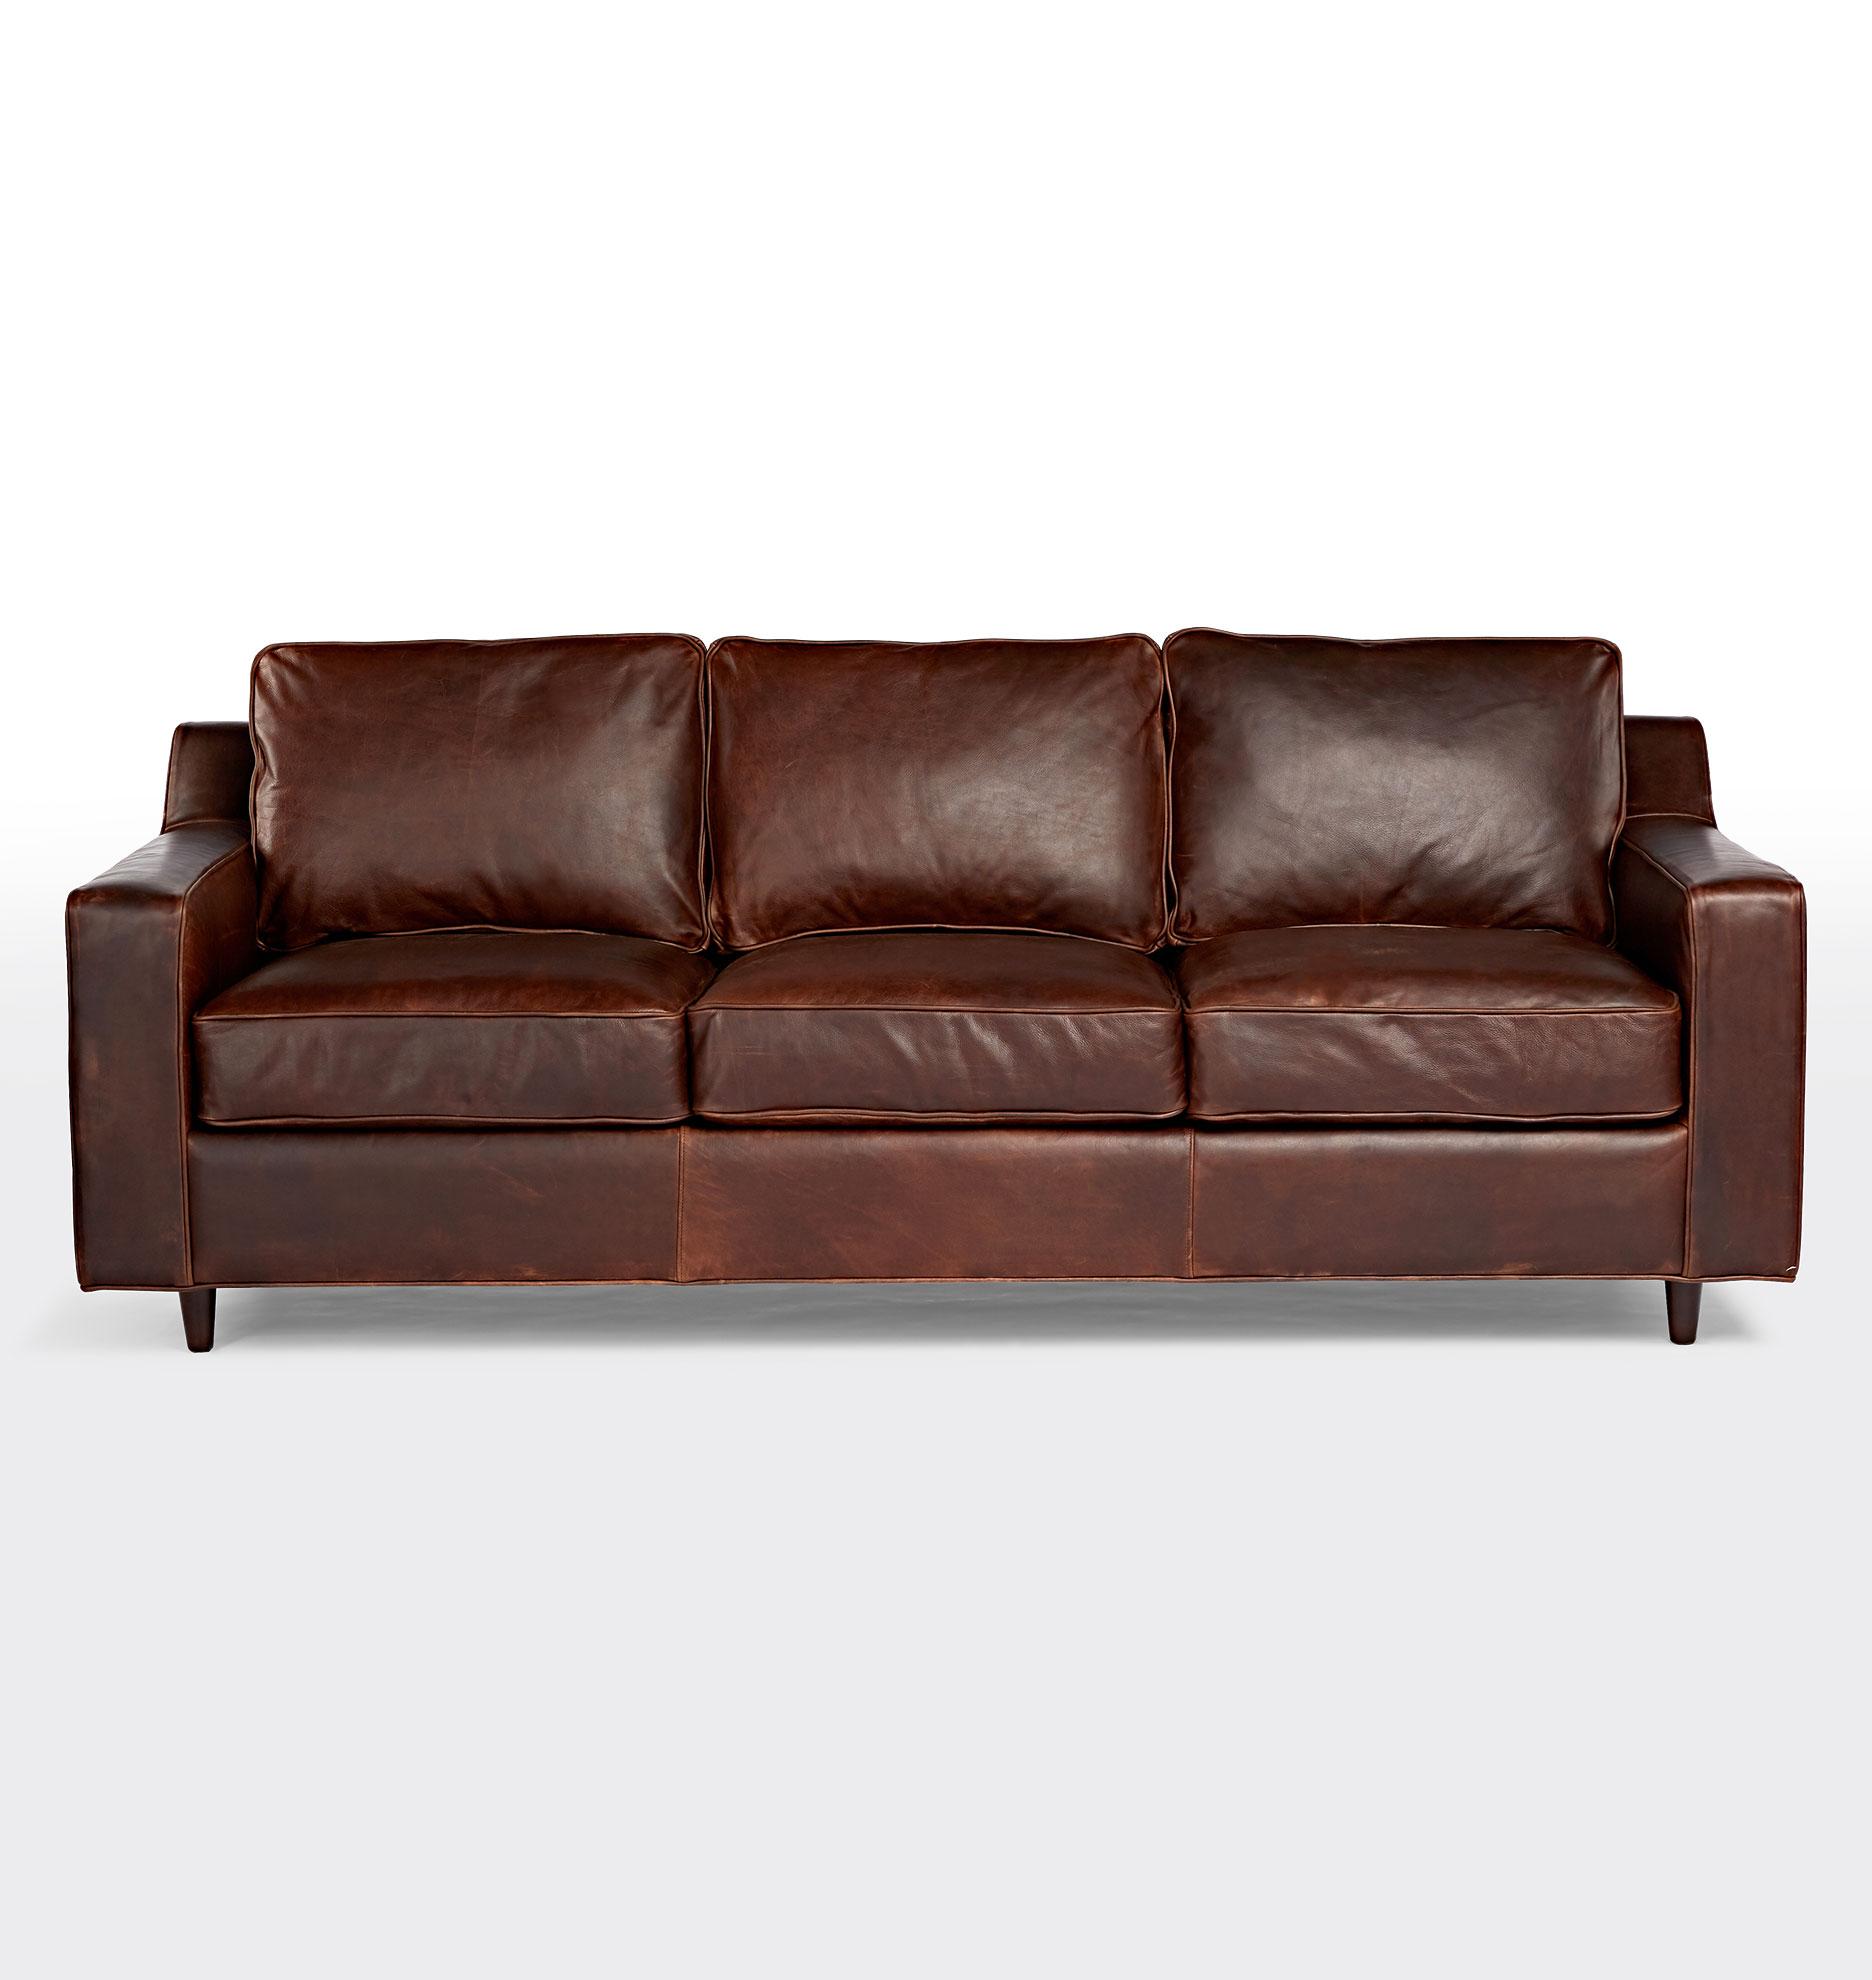 Garrison Leather Sofa